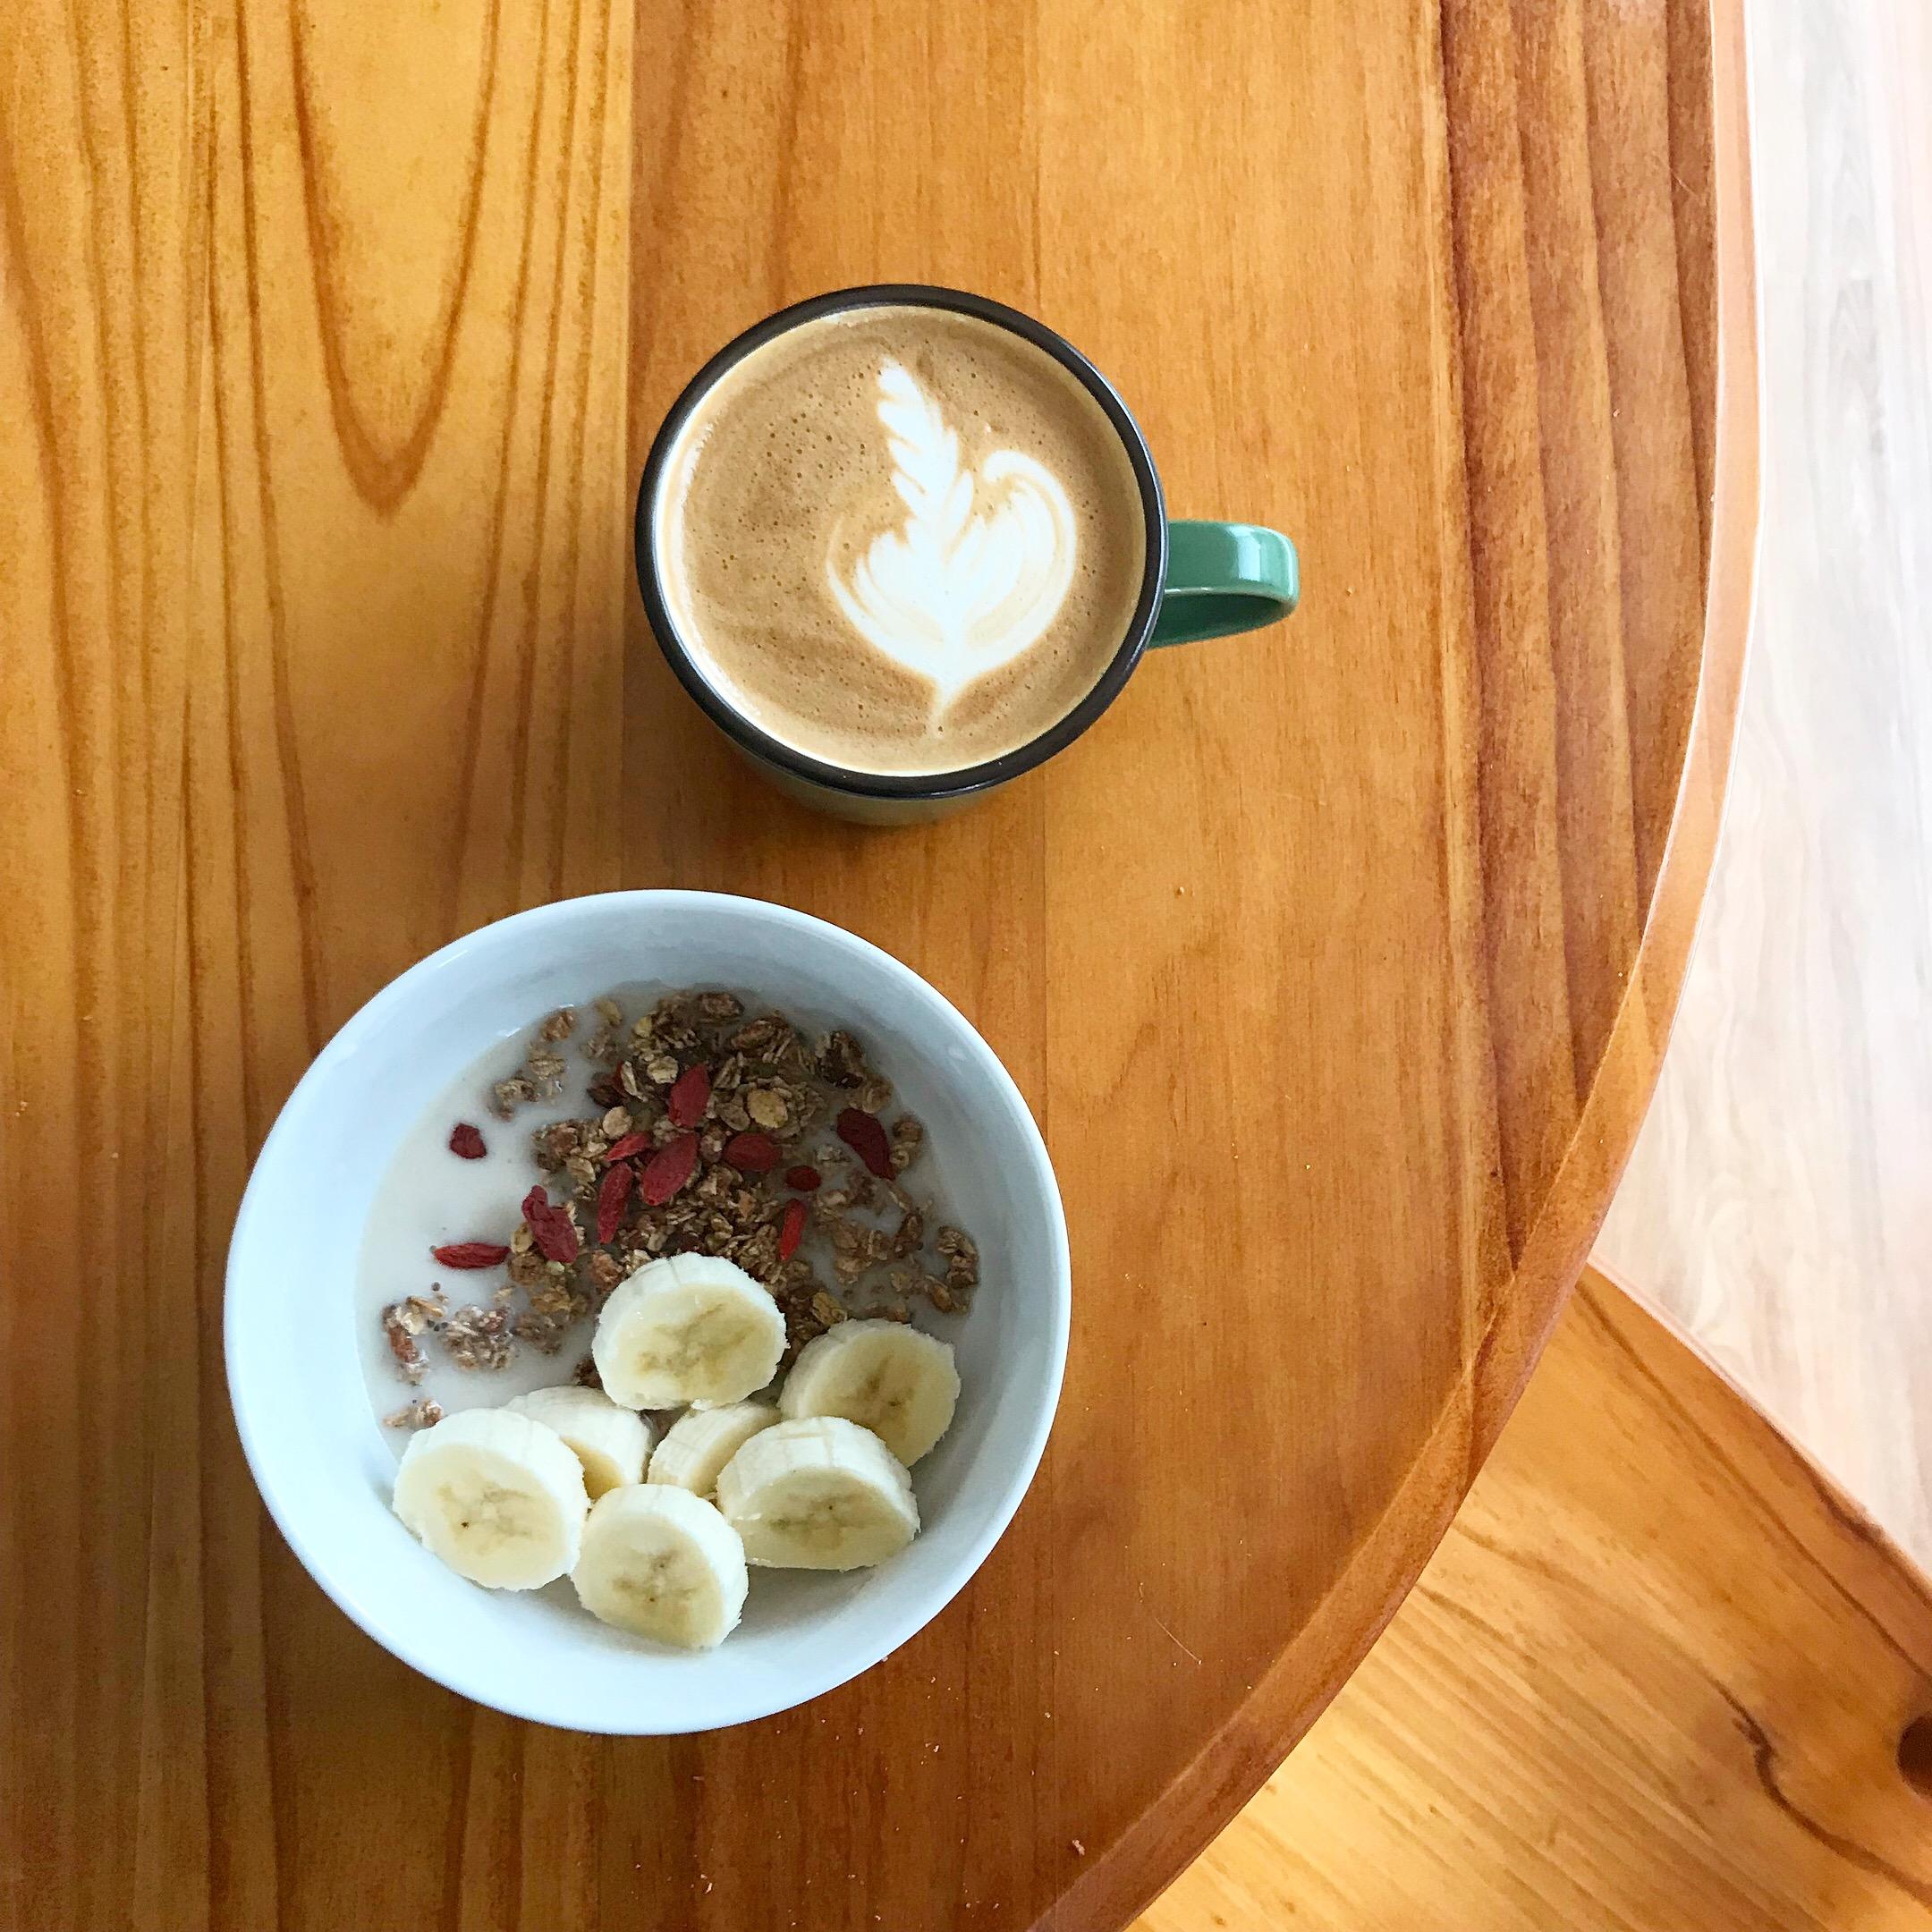 breakfastandcoffee